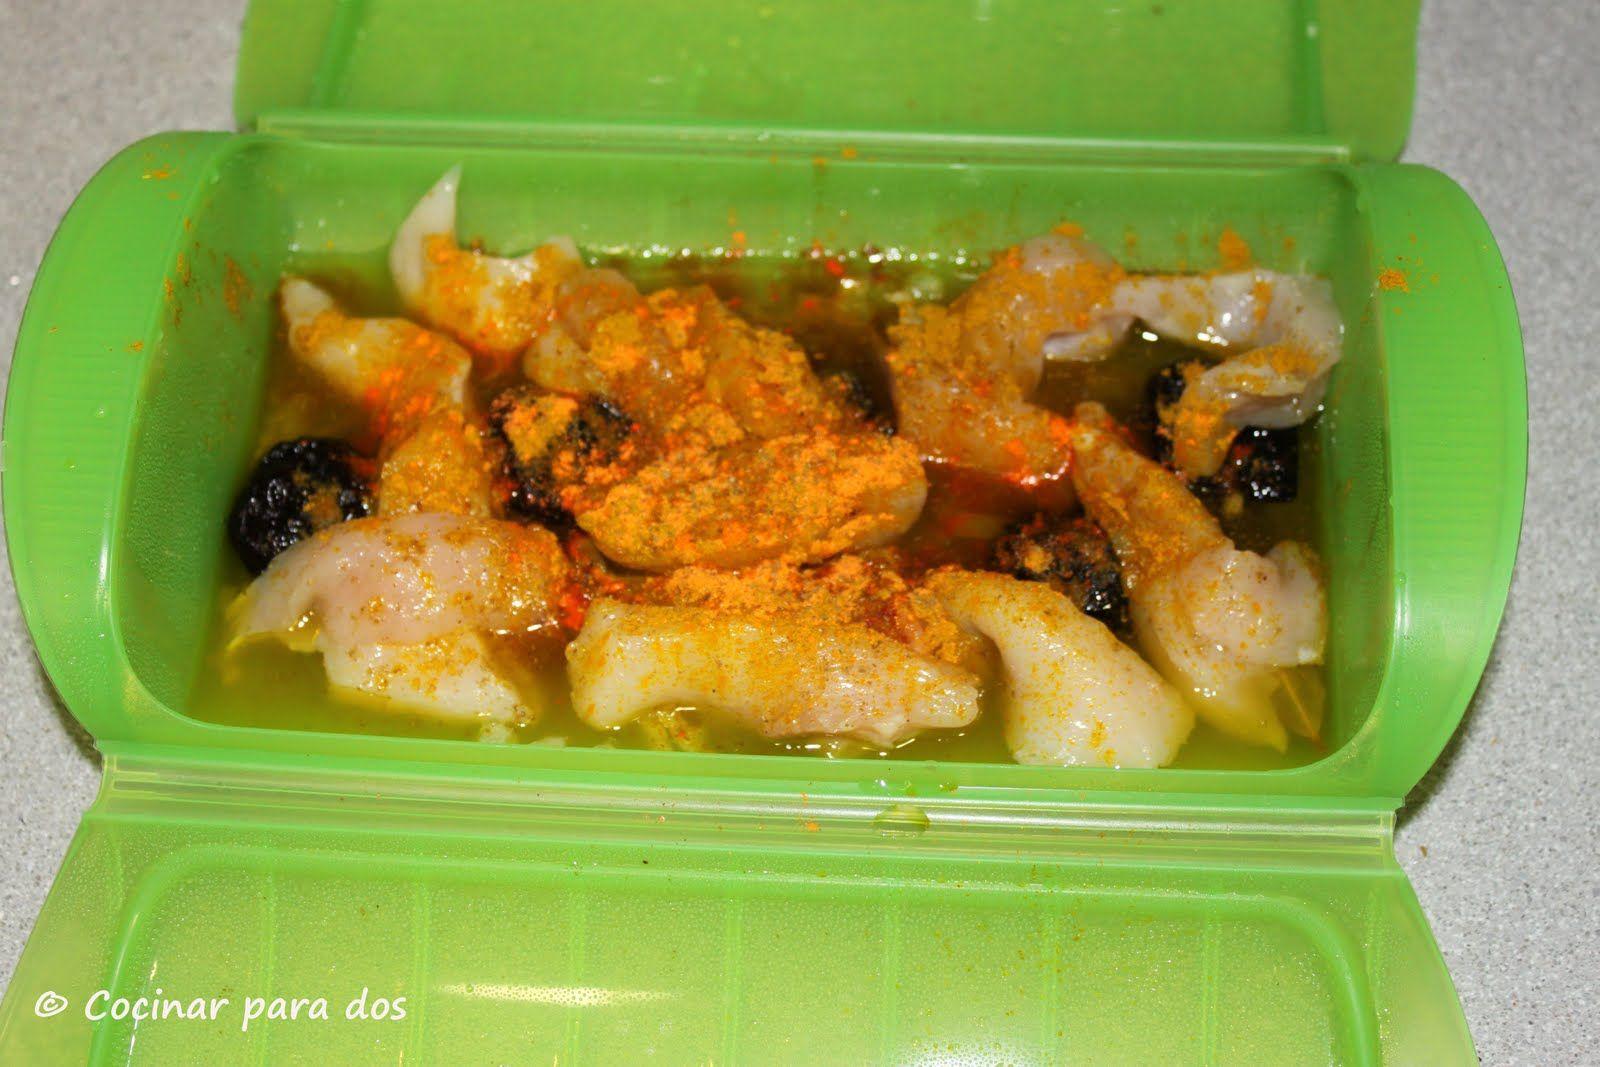 Pollo al curry estuche de vapor l ku y convencional - Asador al vapor lekue ...